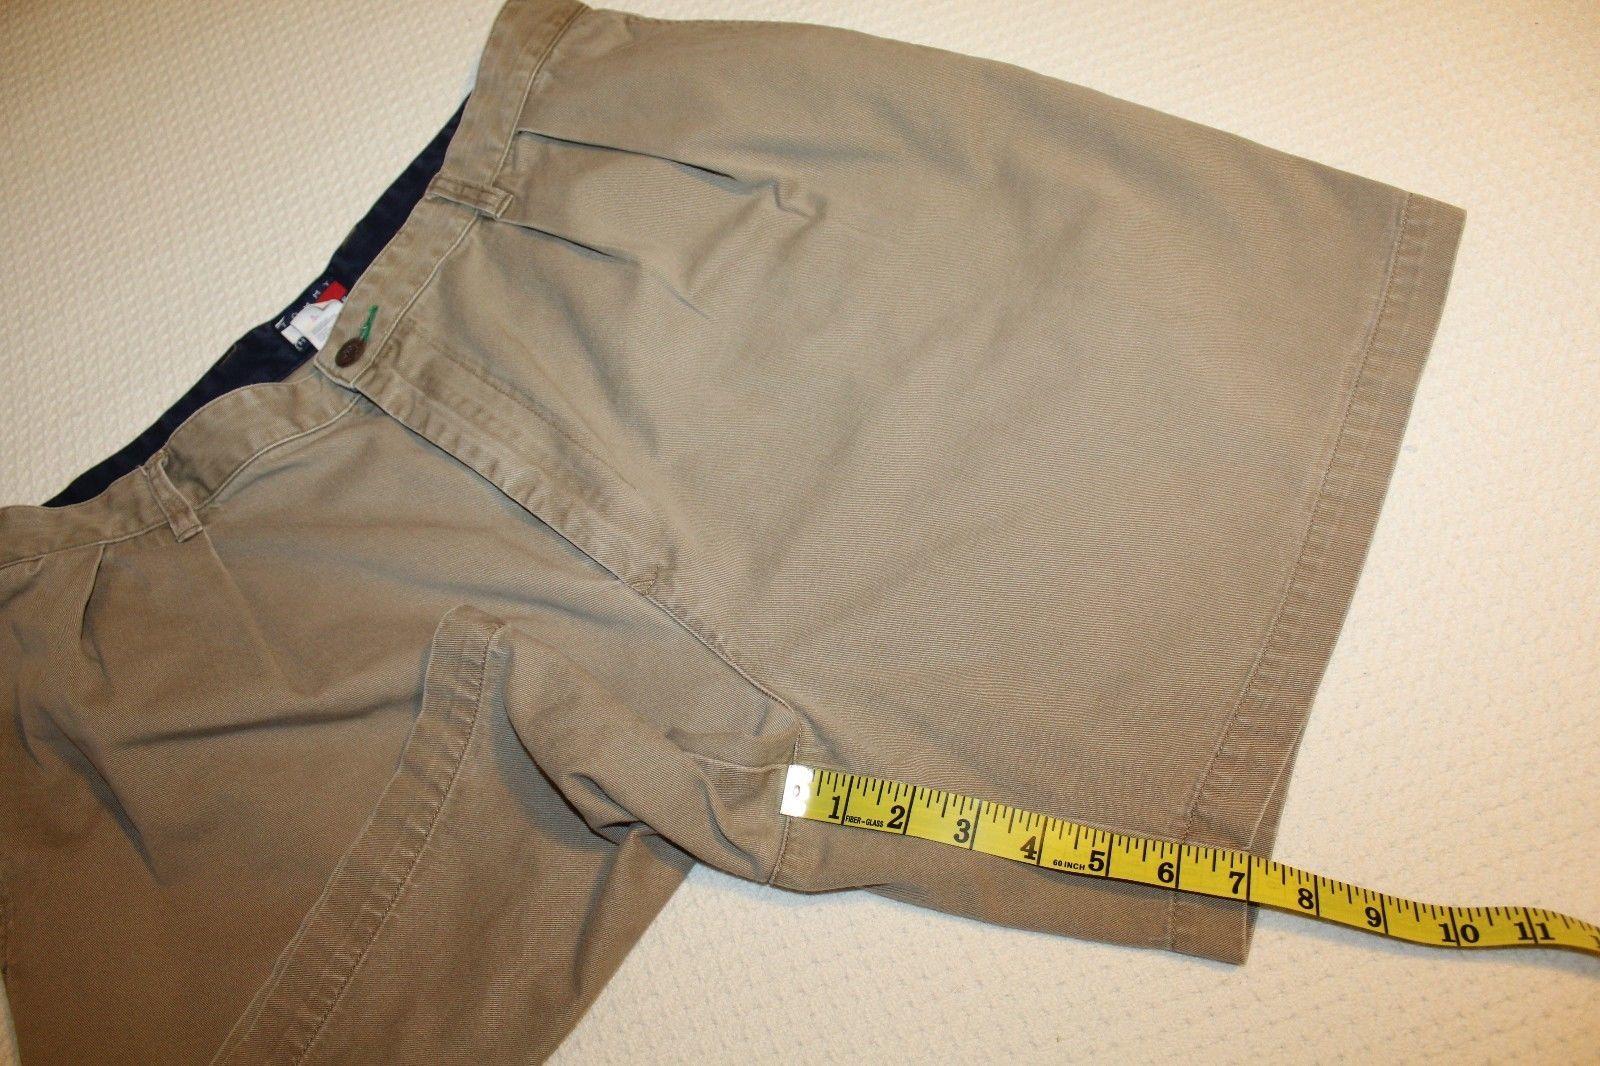 VINTAGE TOMMY HILFIGER Men's Size 38 (Actual 36) Khaki Tan Pleated Shorts GUC